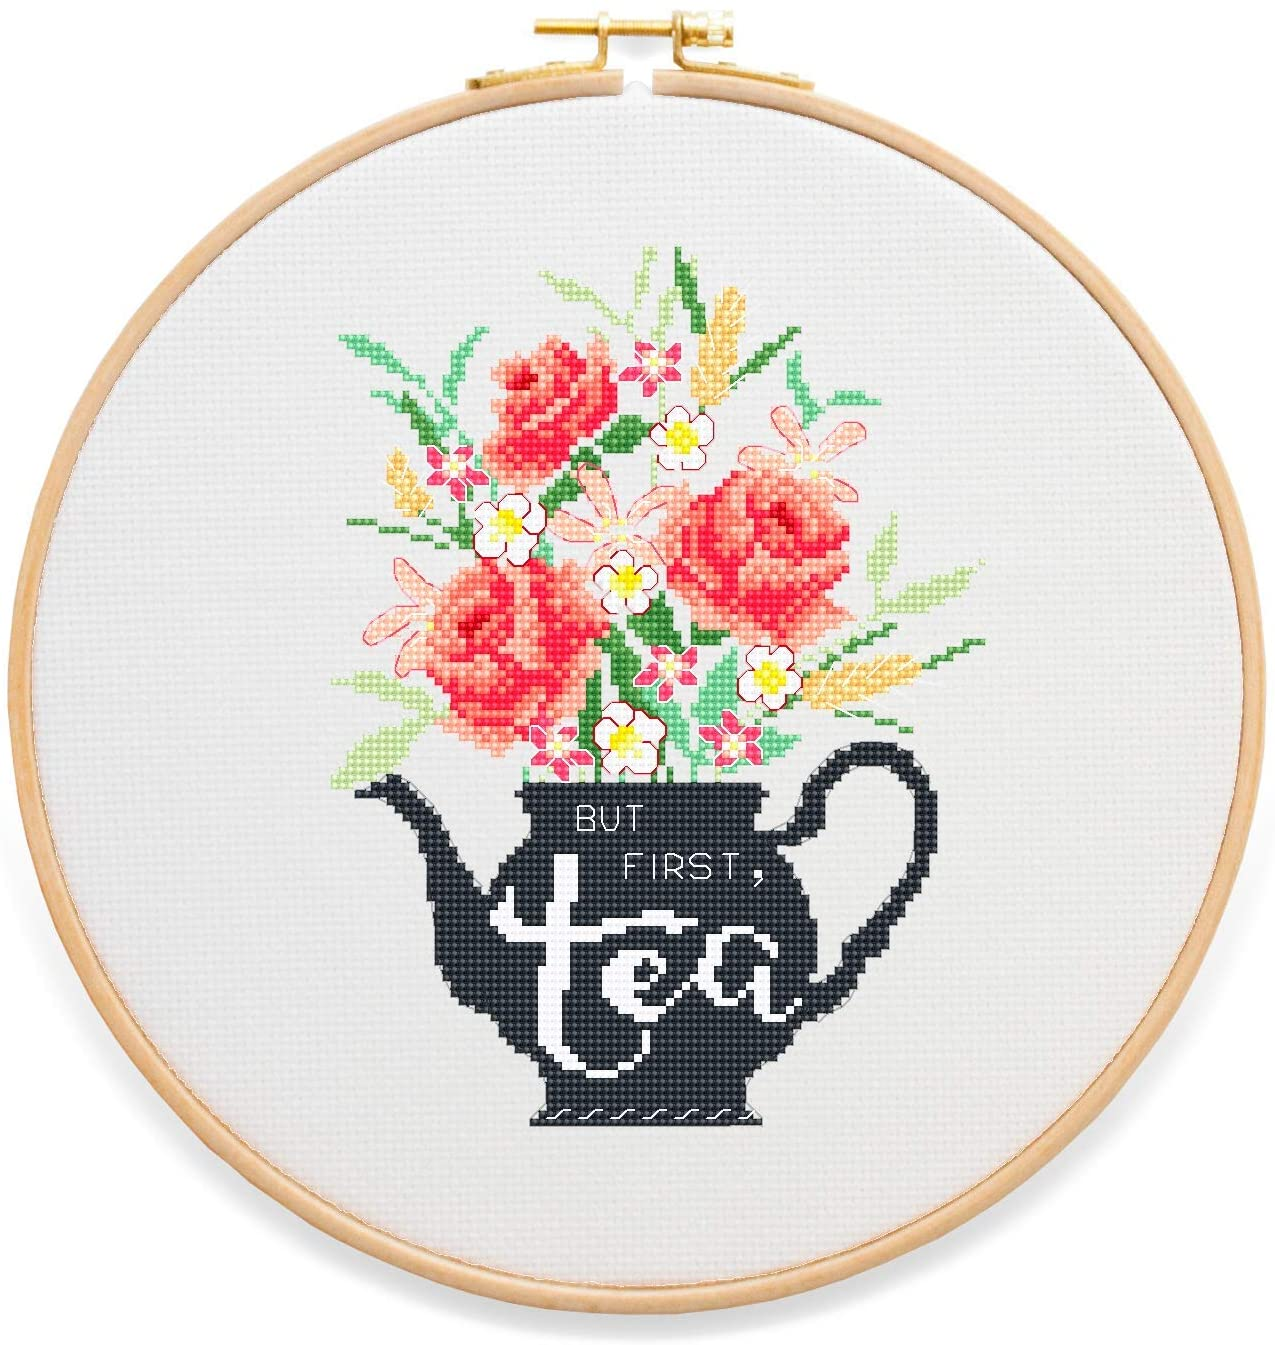 But First Tea Cross Stitch Kit by Stitchering